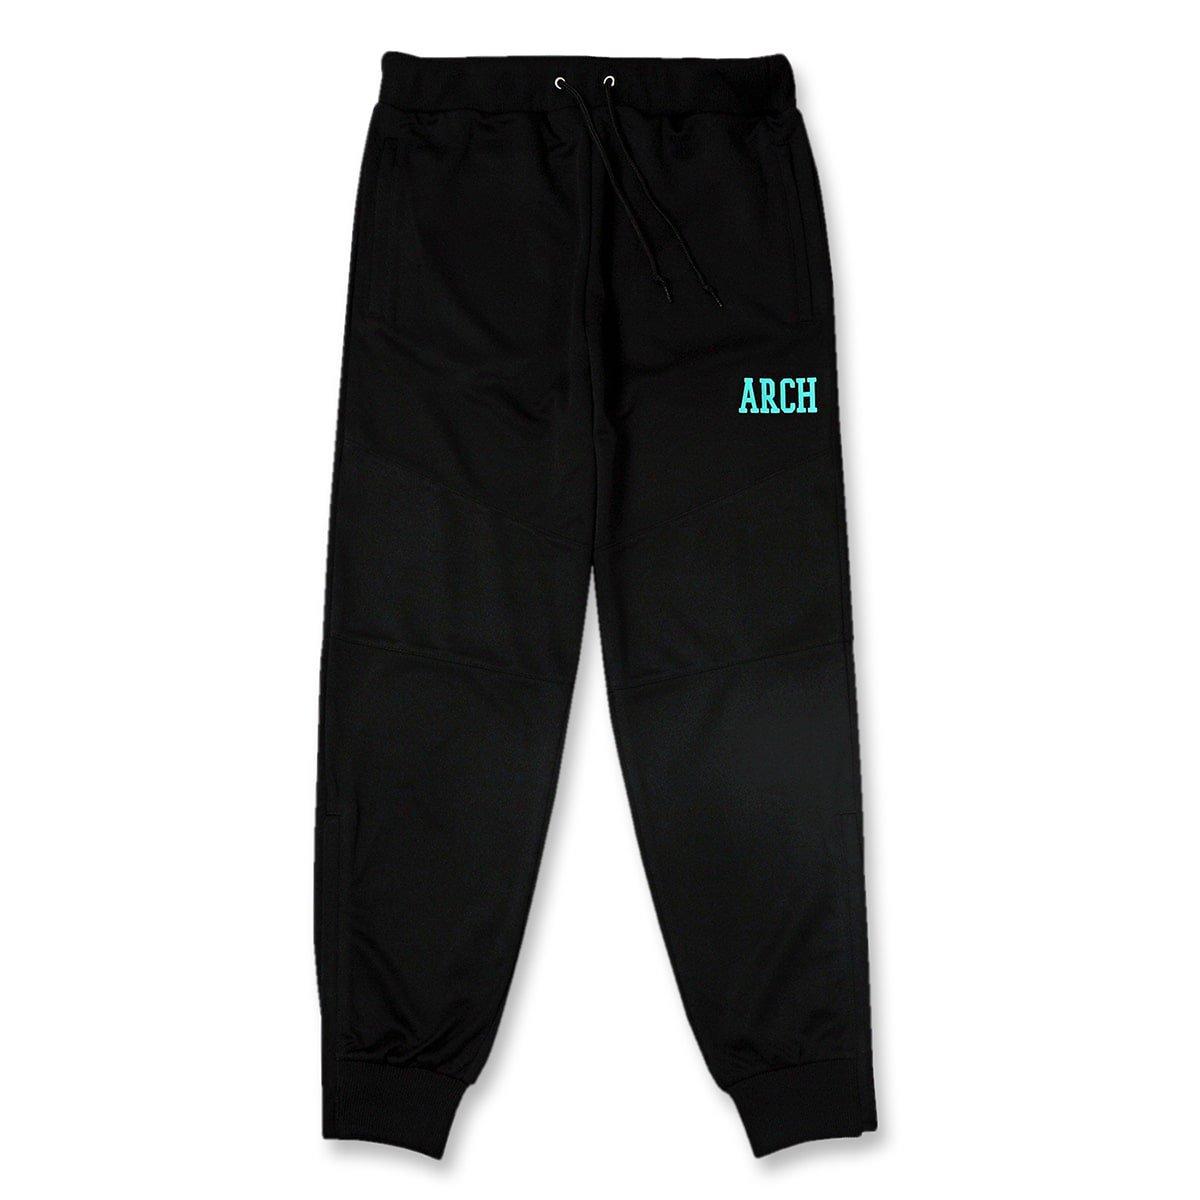 jersey jogger pants【black】